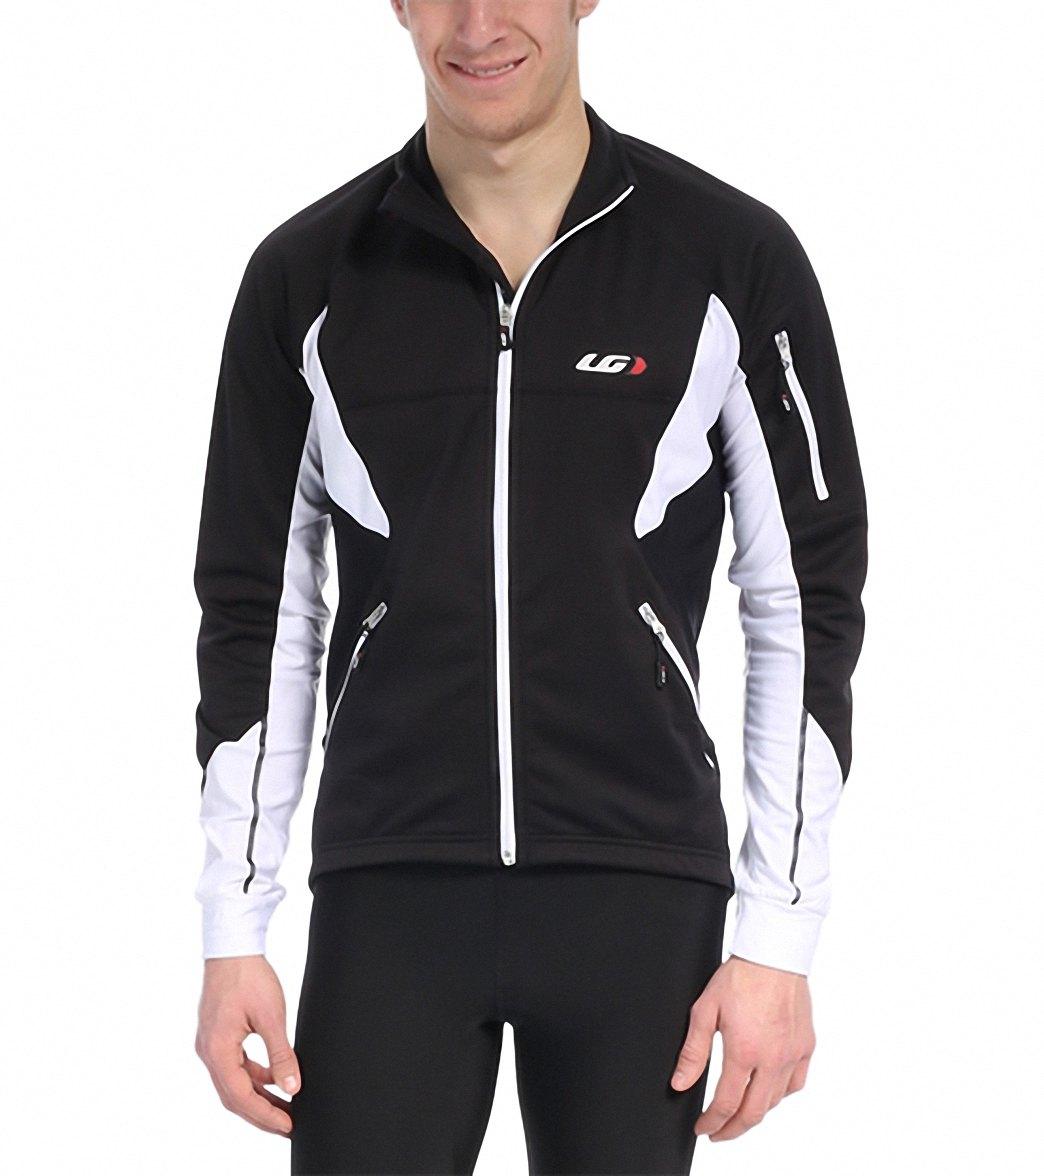 ... Louis Garneau Men s Enerblock Cycling Jacket 2 Play Video. MODEL  MEASUREMENTS 5d40e6cdf